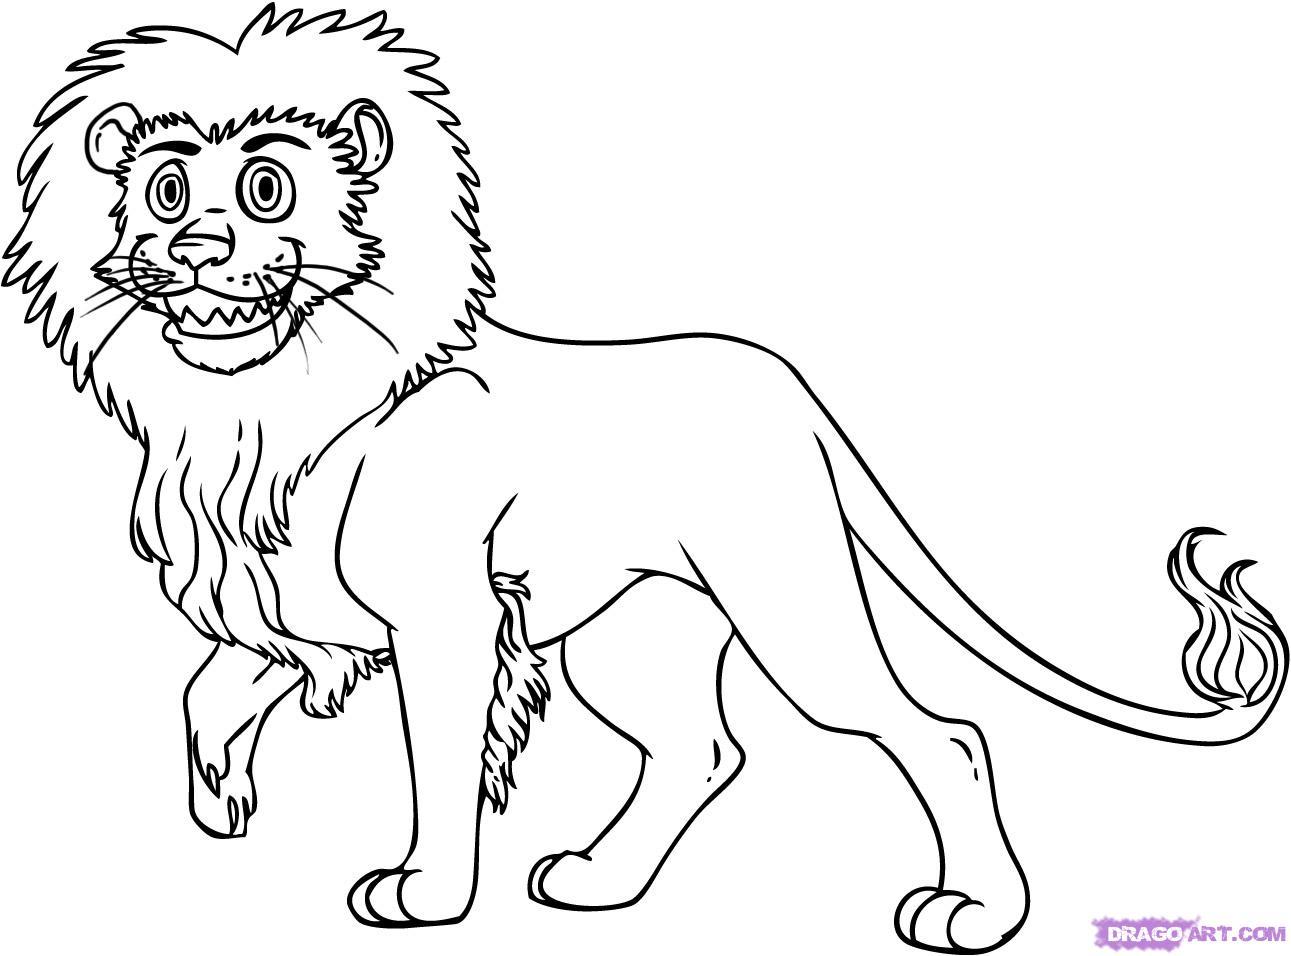 How To Draw A Cartoon Lion Step By Step Cartoon Animals